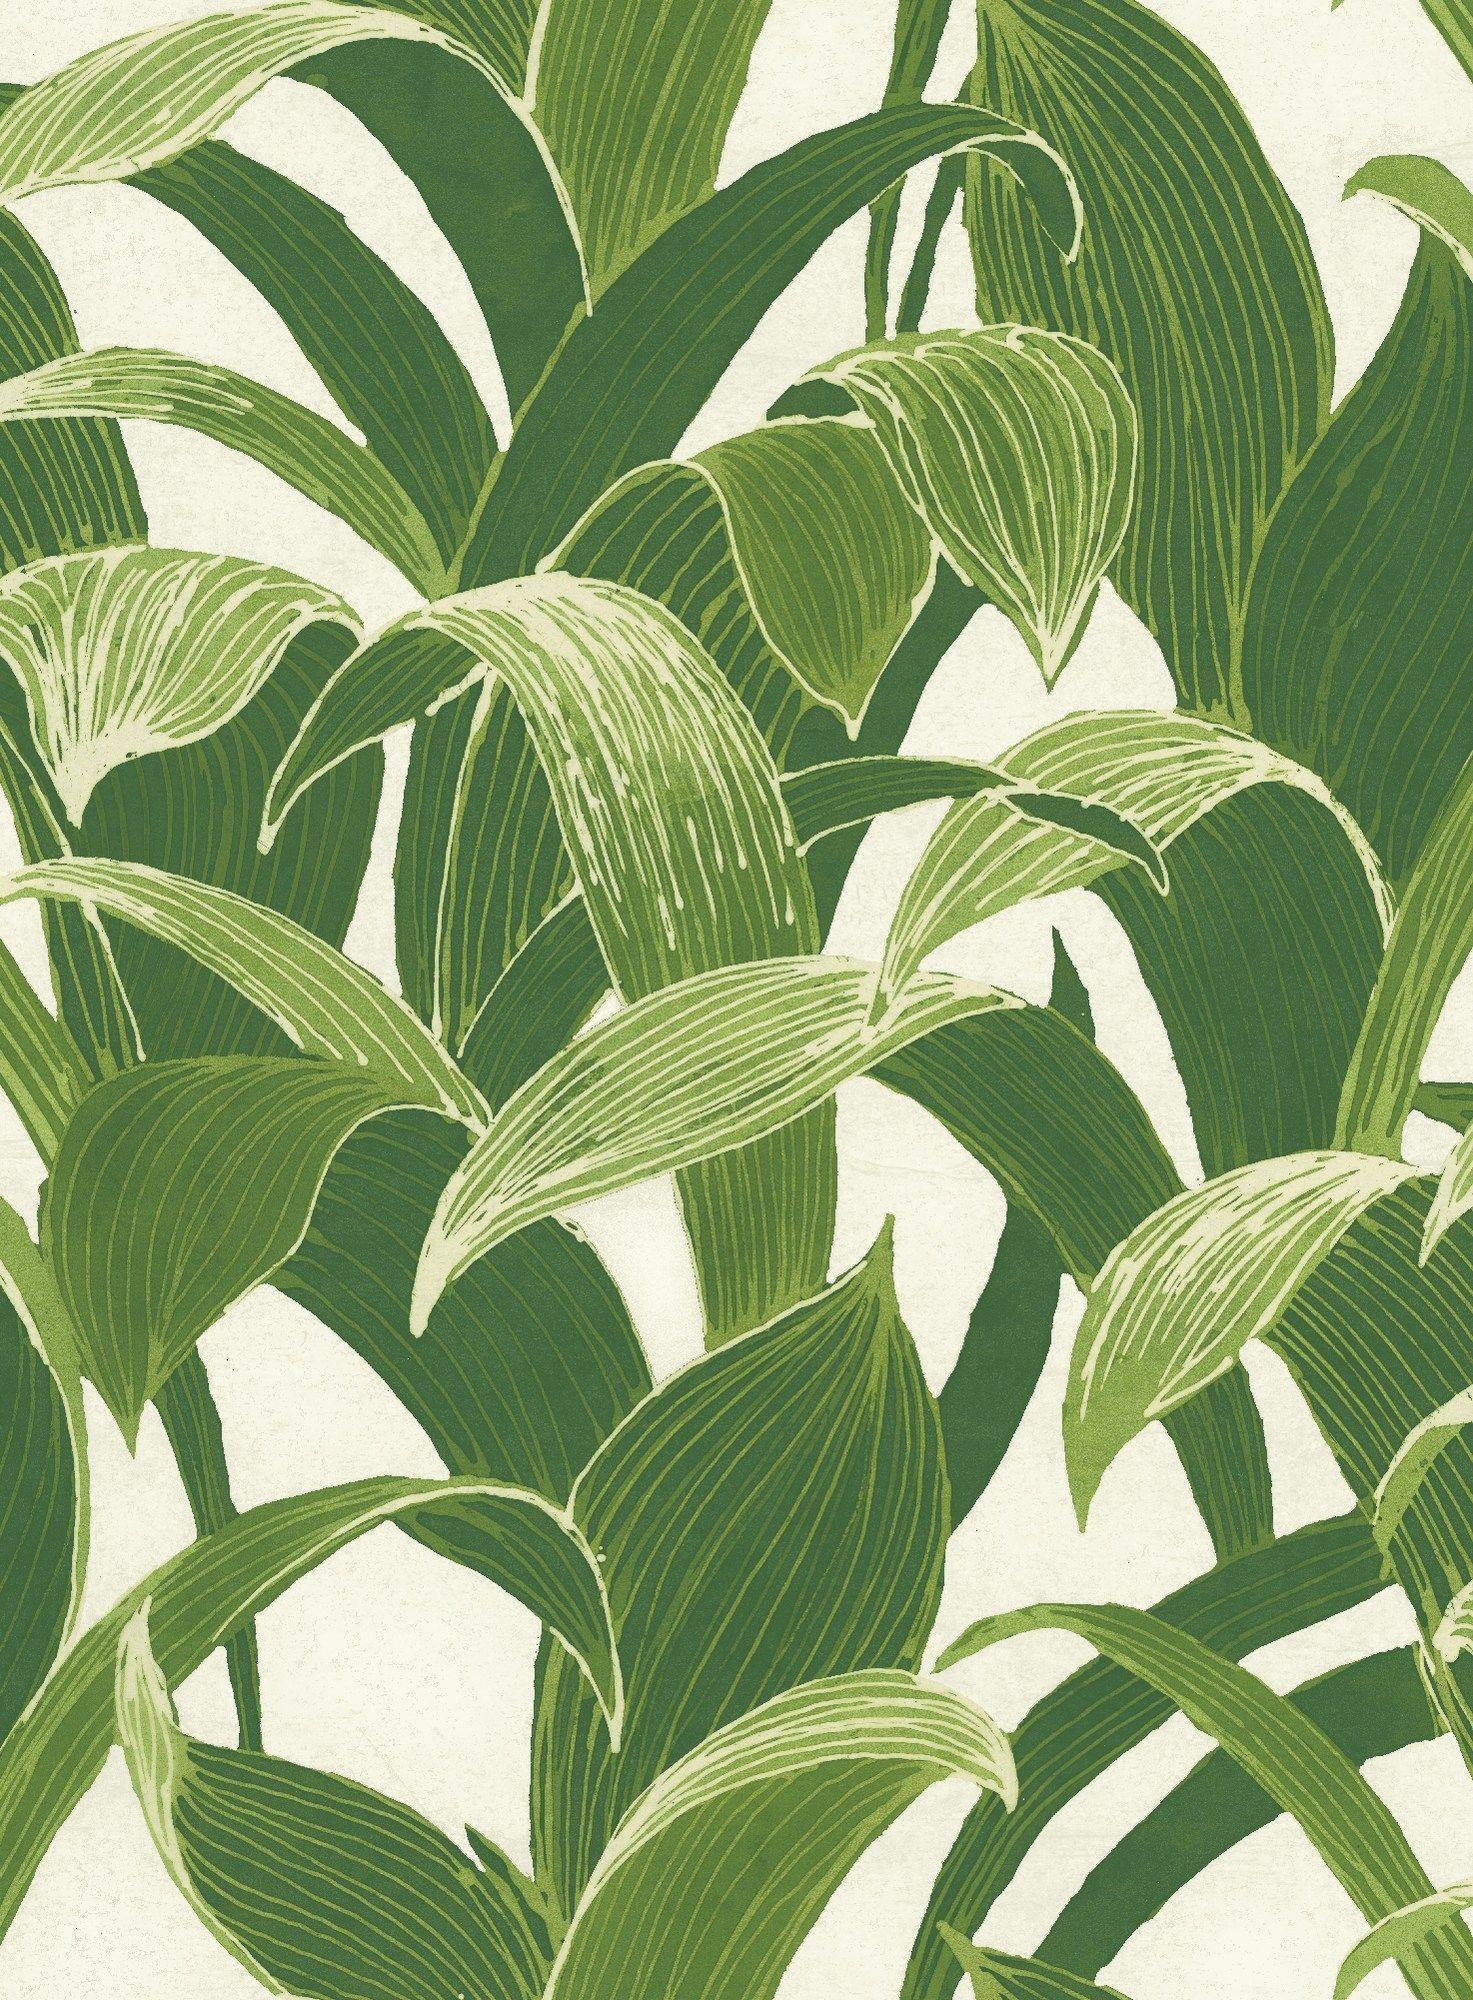 Tropical Banana Leaves Peel Stick Wallpaper Gw1004 Green Seabrook Designs Peel And Stick Wallpaper Leaf Wallpaper